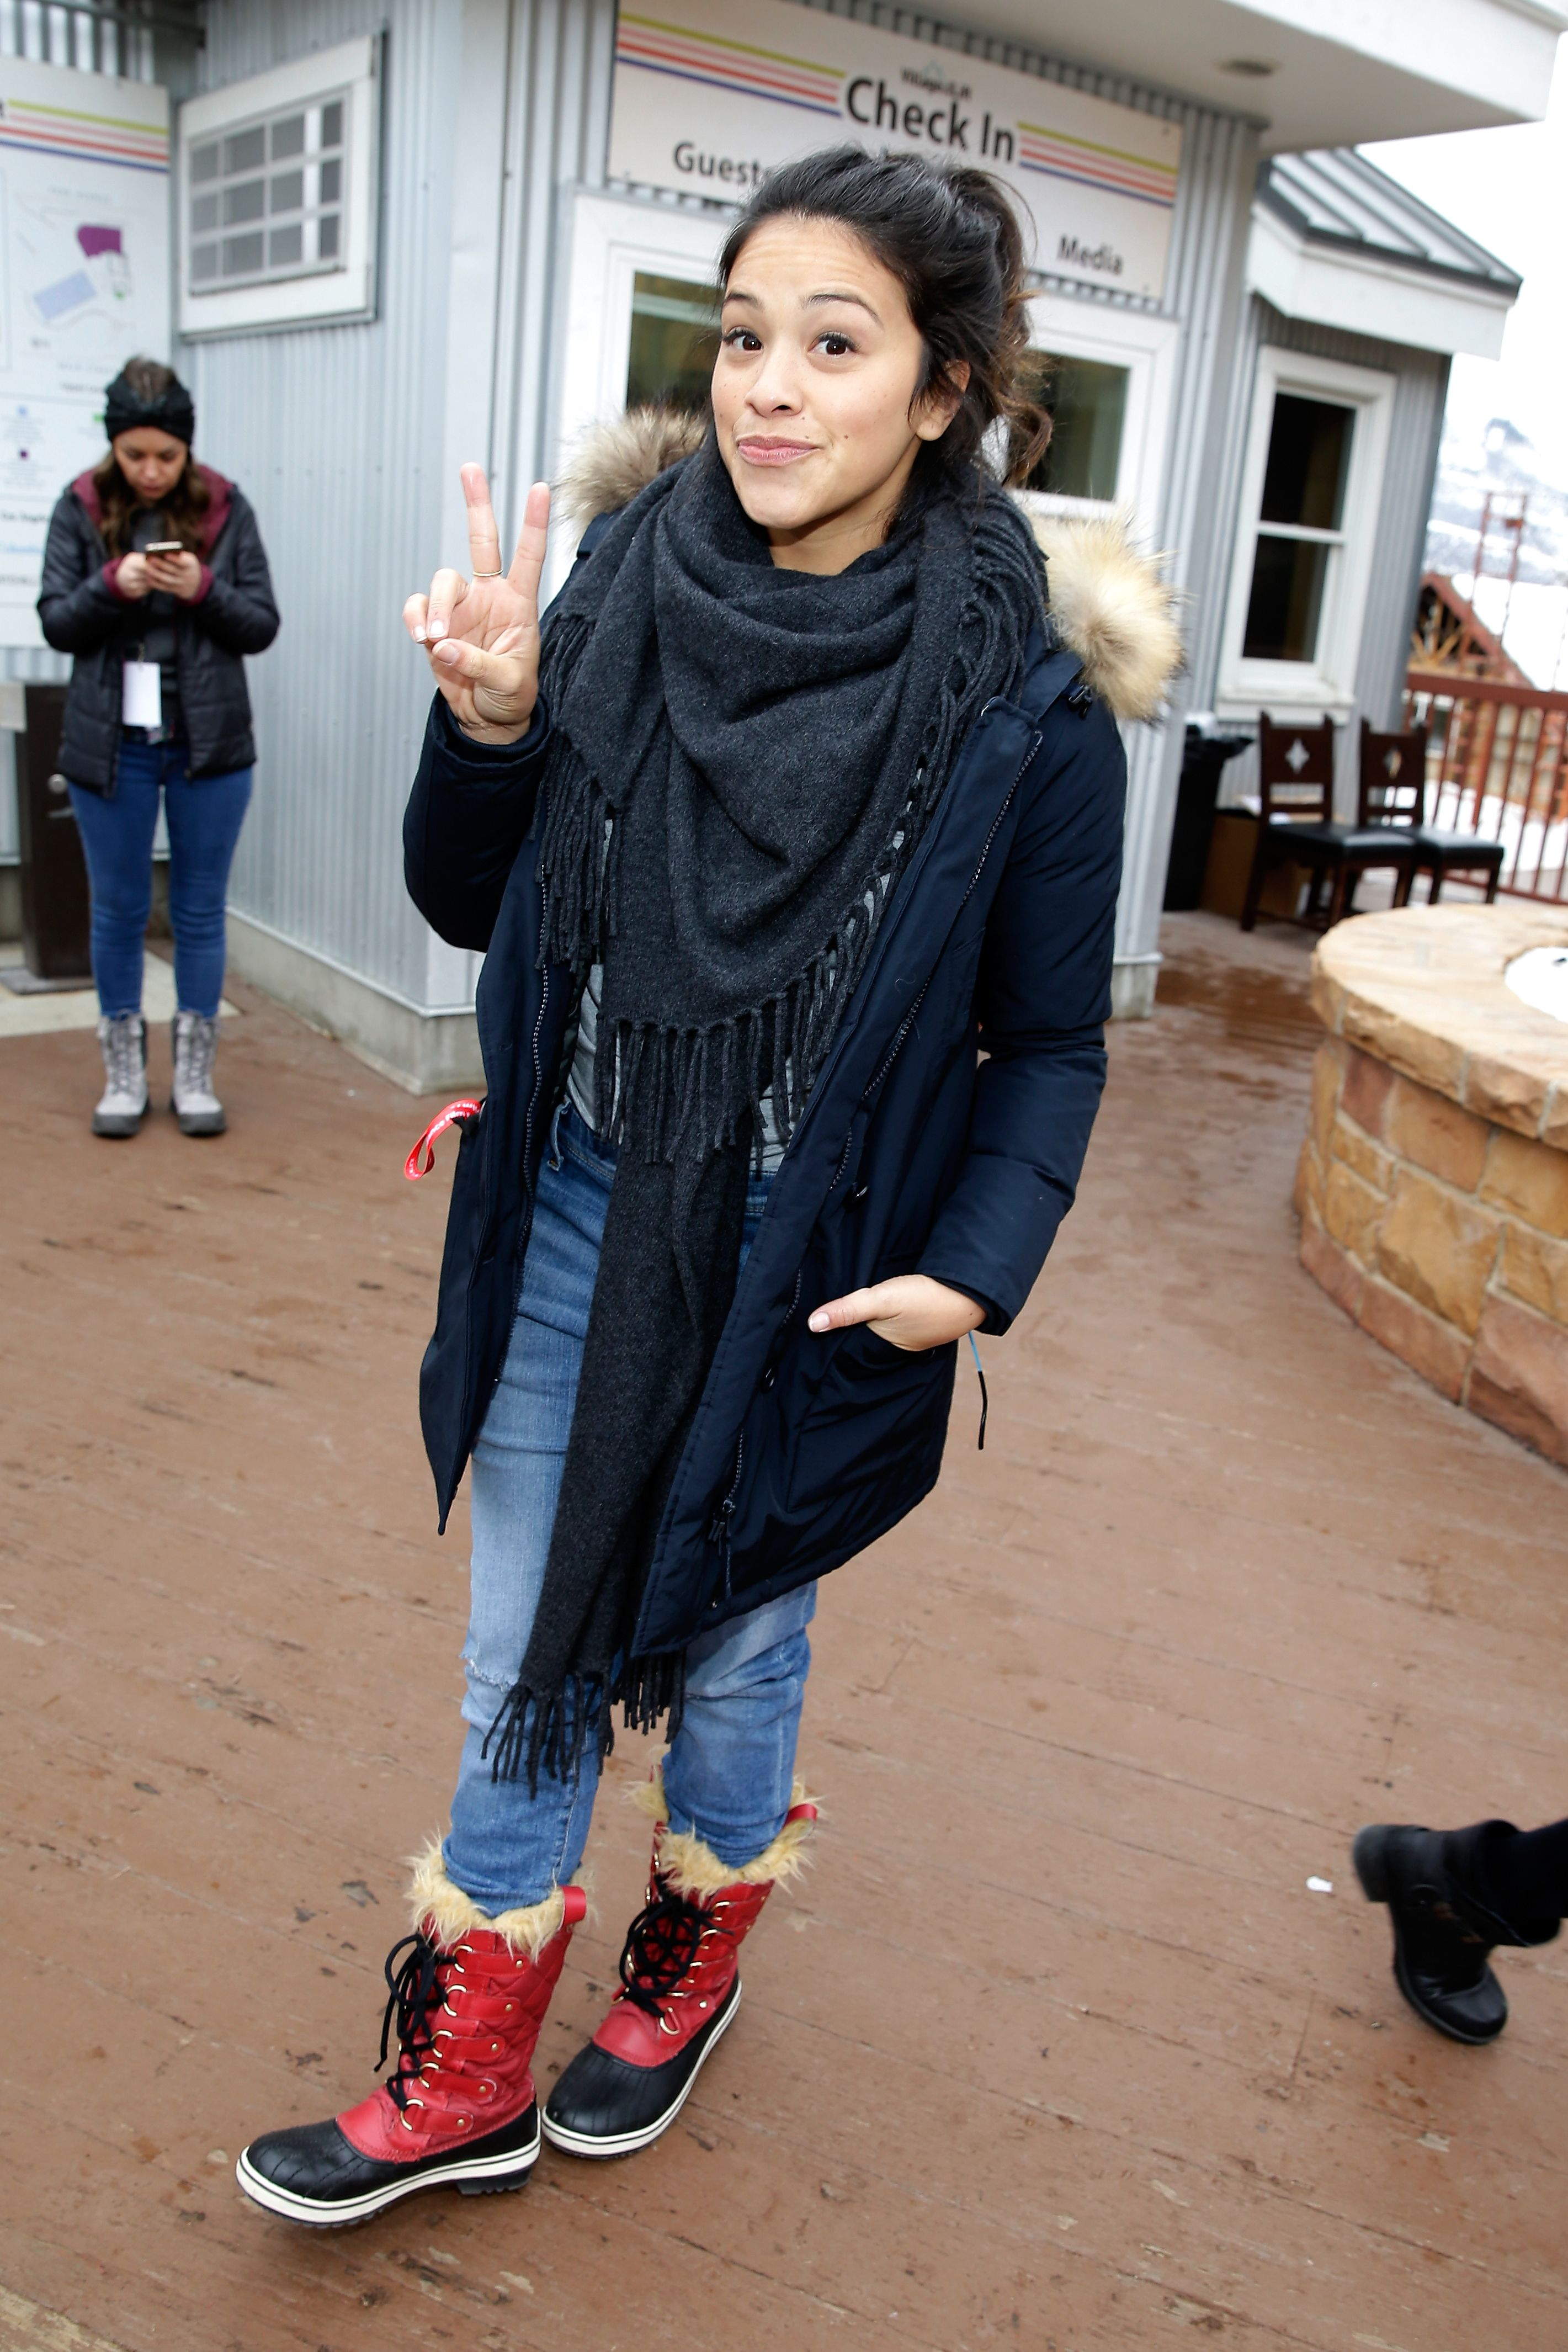 Celebrities at Sundance Show Off Their Chic Winter Style: Rooney Mara, Nicole Kidman,More Celebrities at Sundance Show Off Their Chic Winter Style: Rooney Mara, Nicole Kidman,More new photo